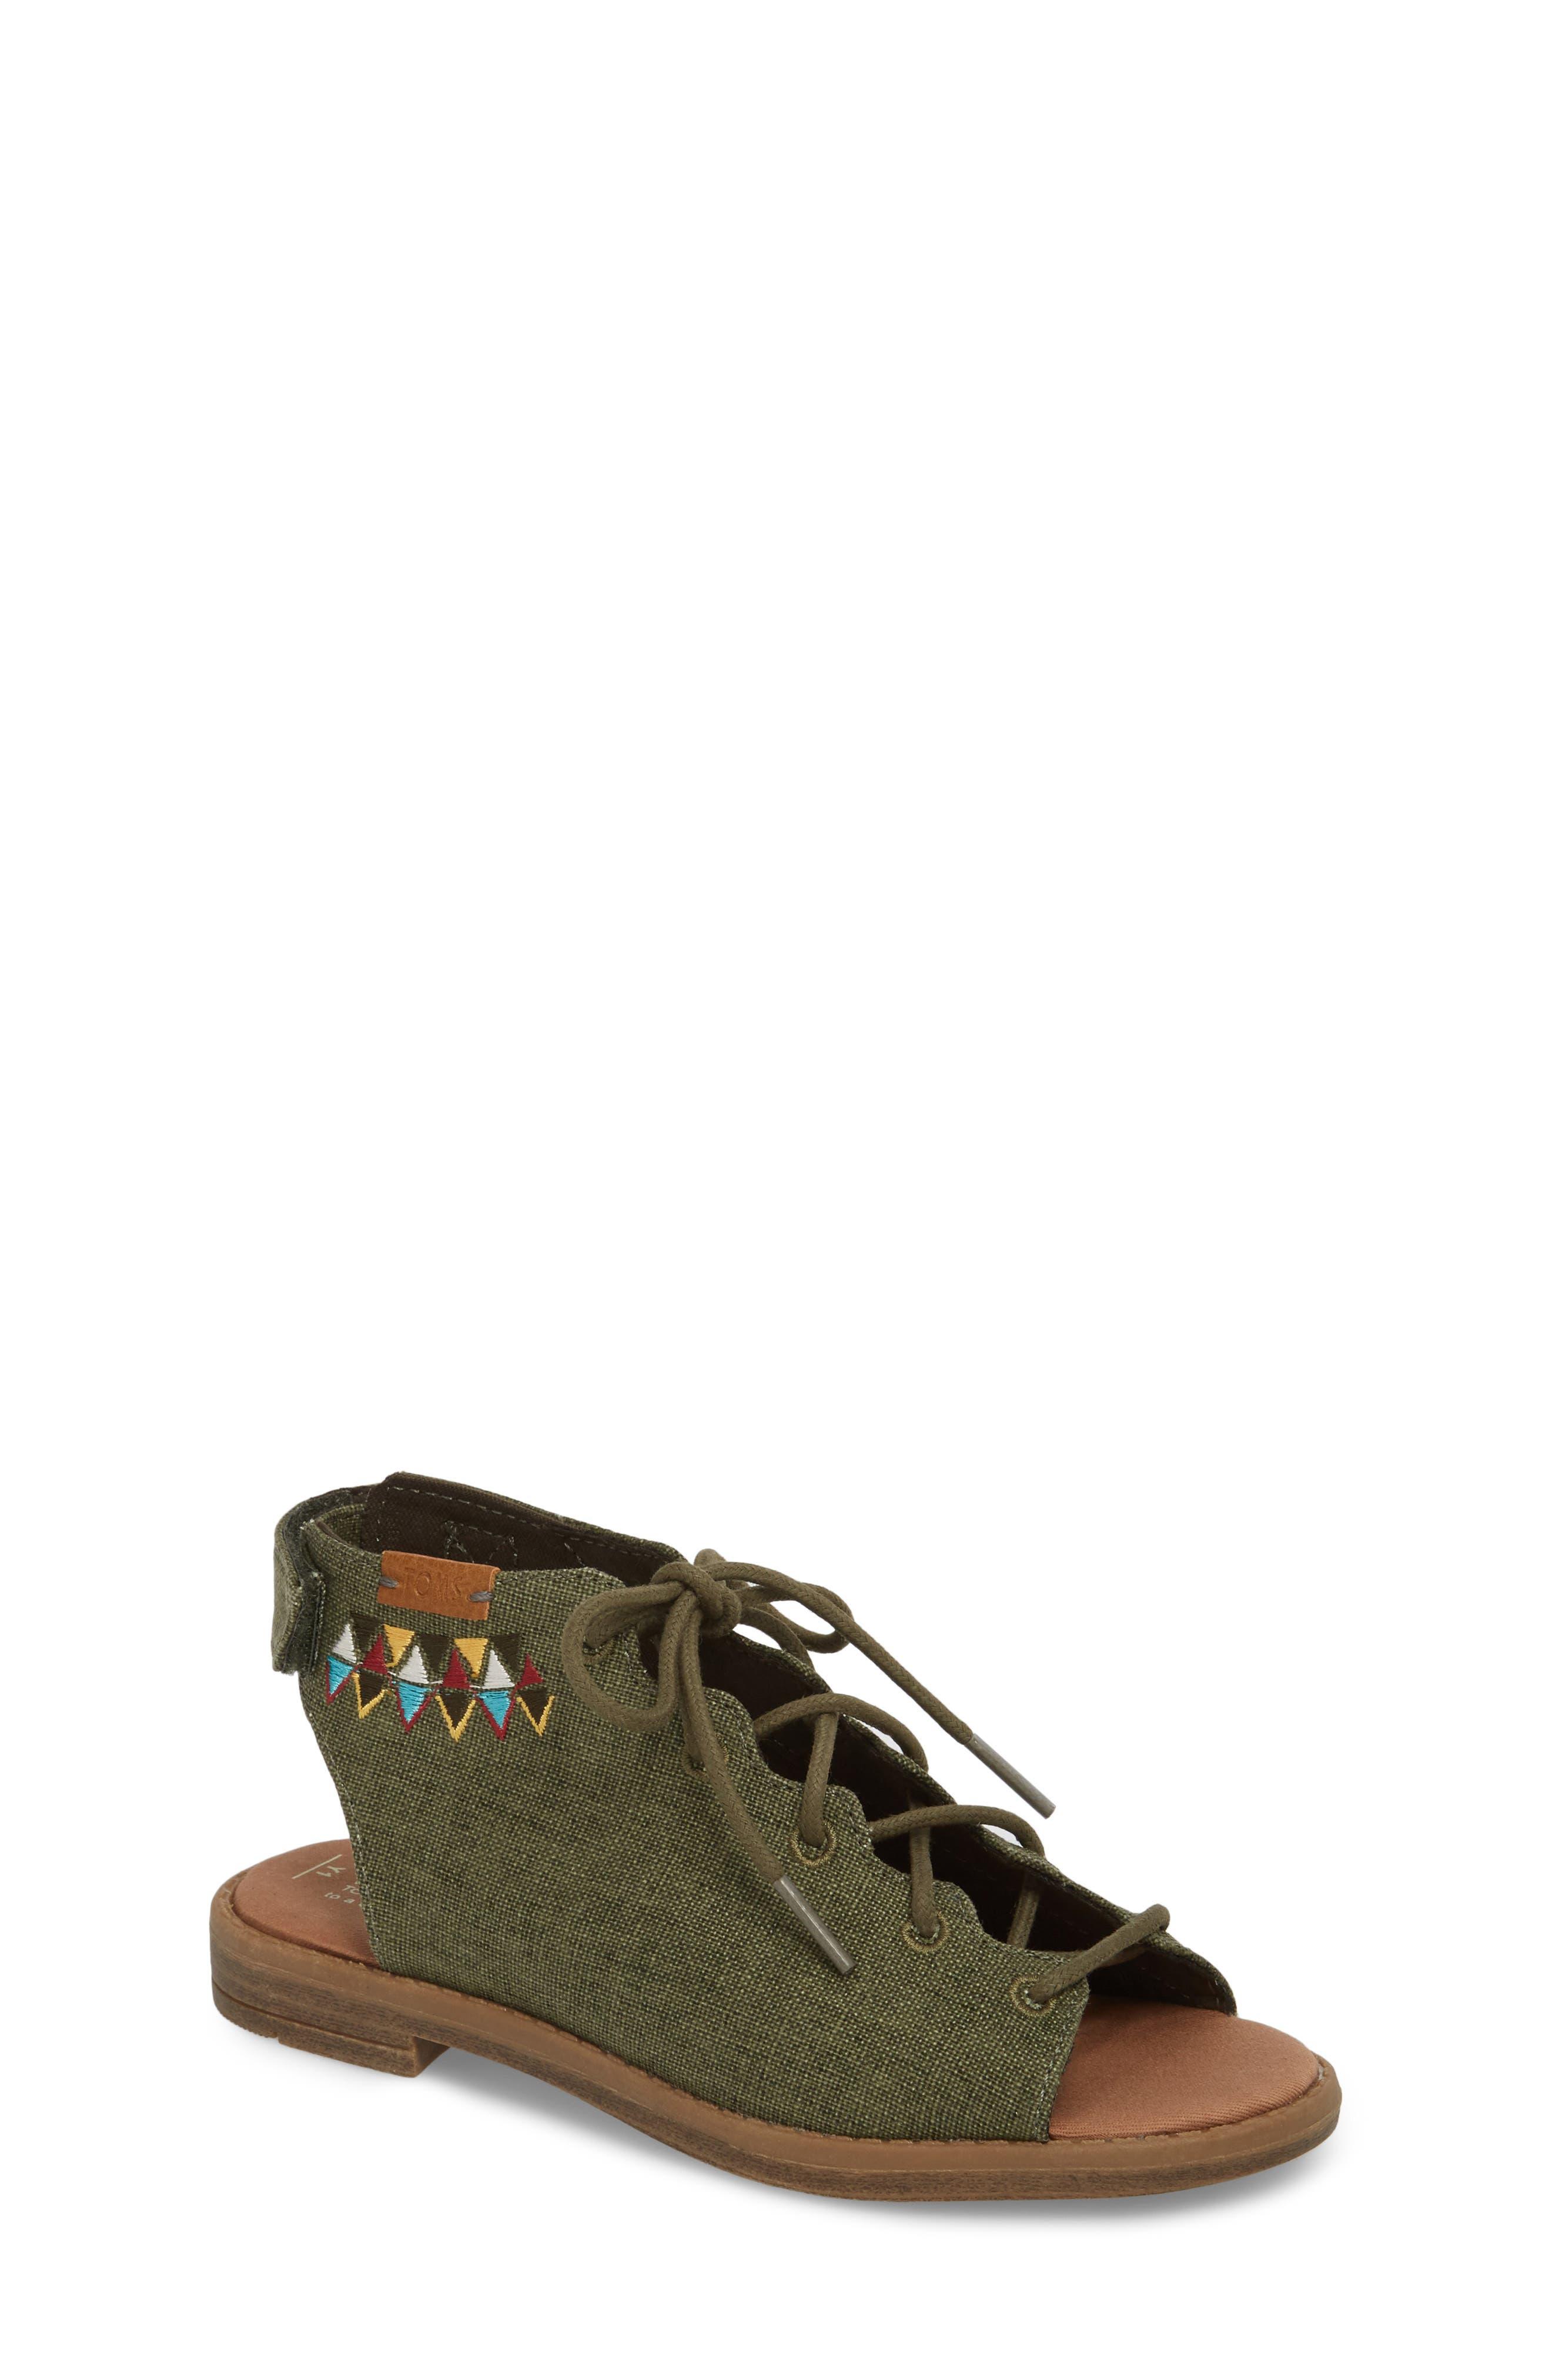 Uma Sandal,                         Main,                         color, Cypress Coated Linen